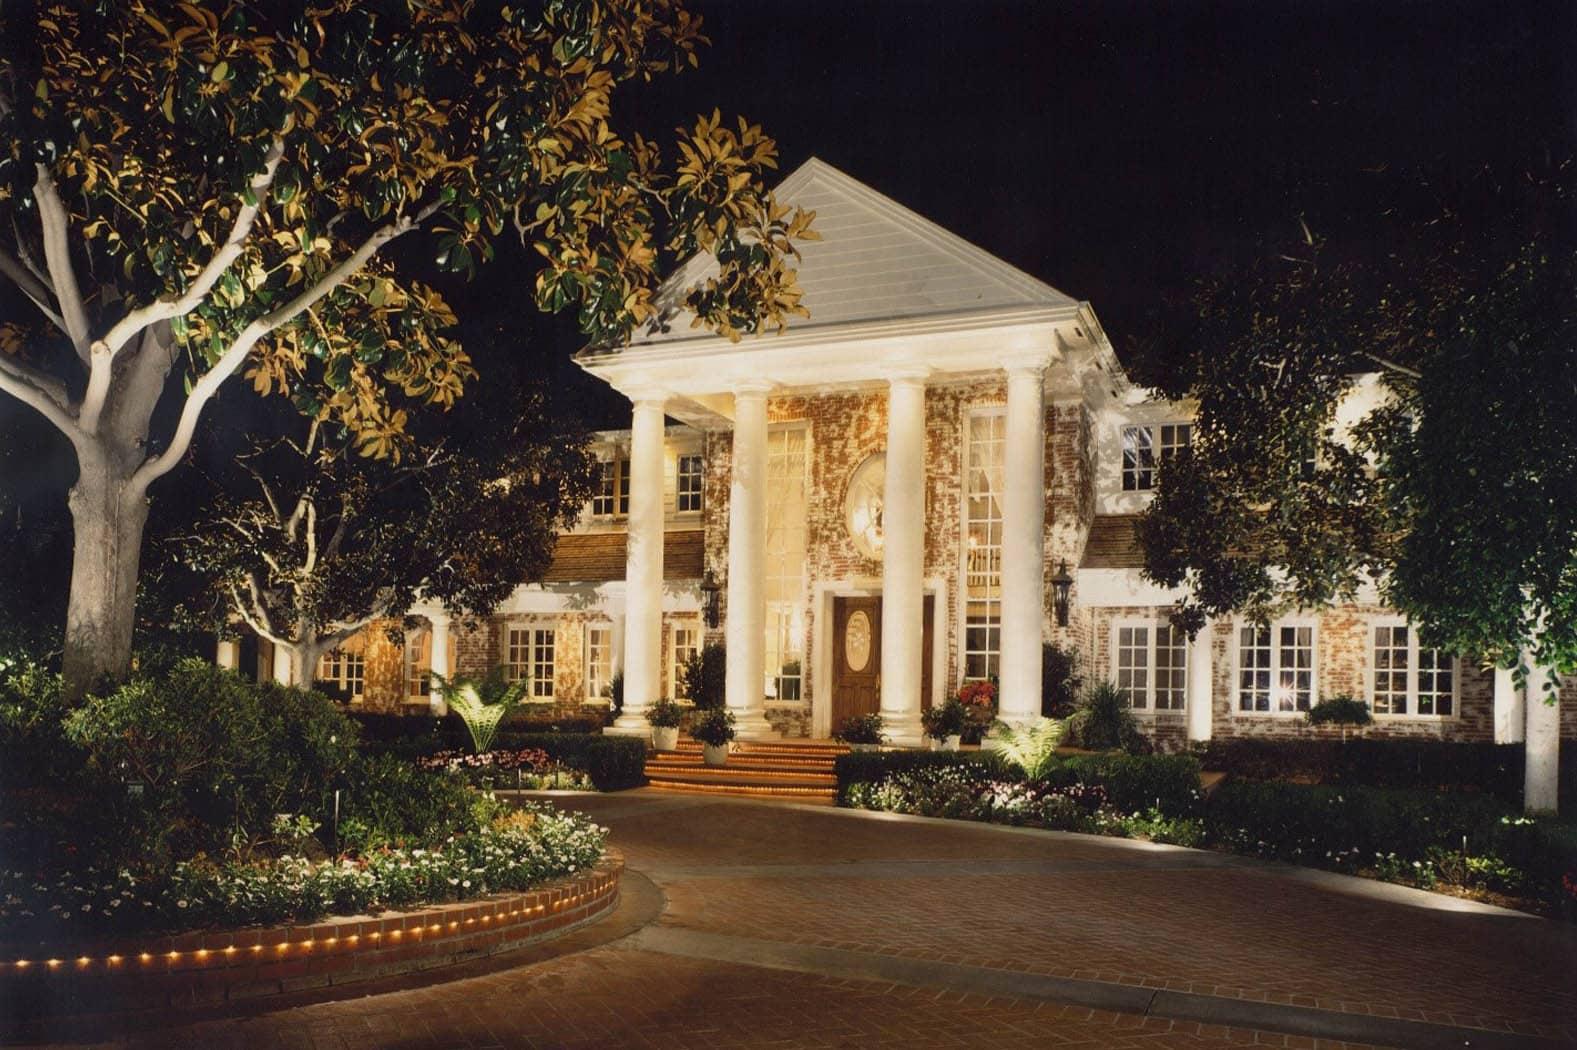 Outdoor Lighting Design Services Laugana hills & Orange County Ca